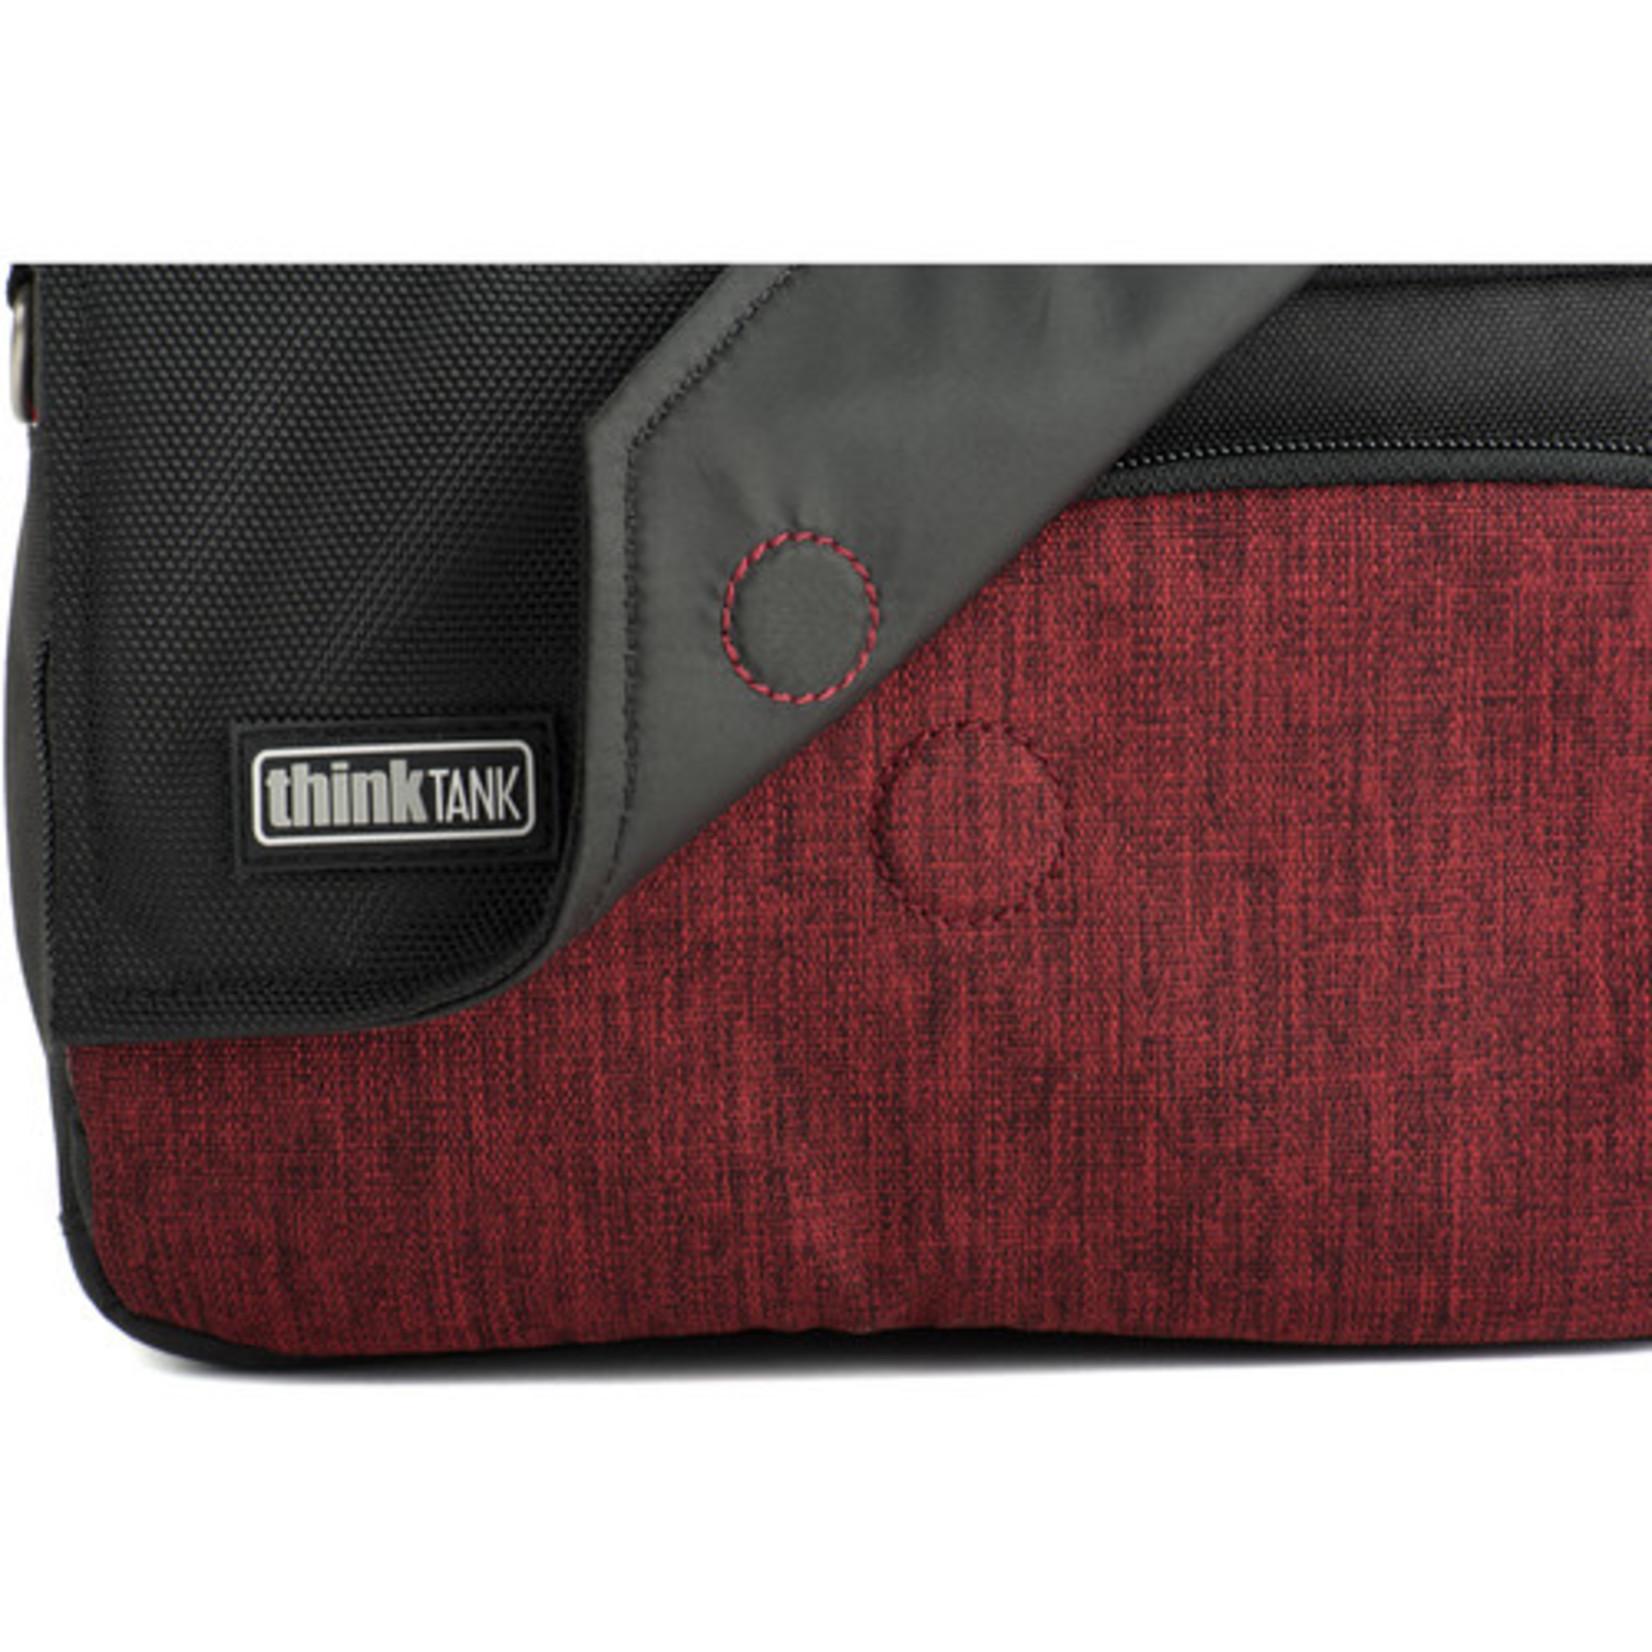 ThinkTank Mirrorless Mover 30i - Deep Red